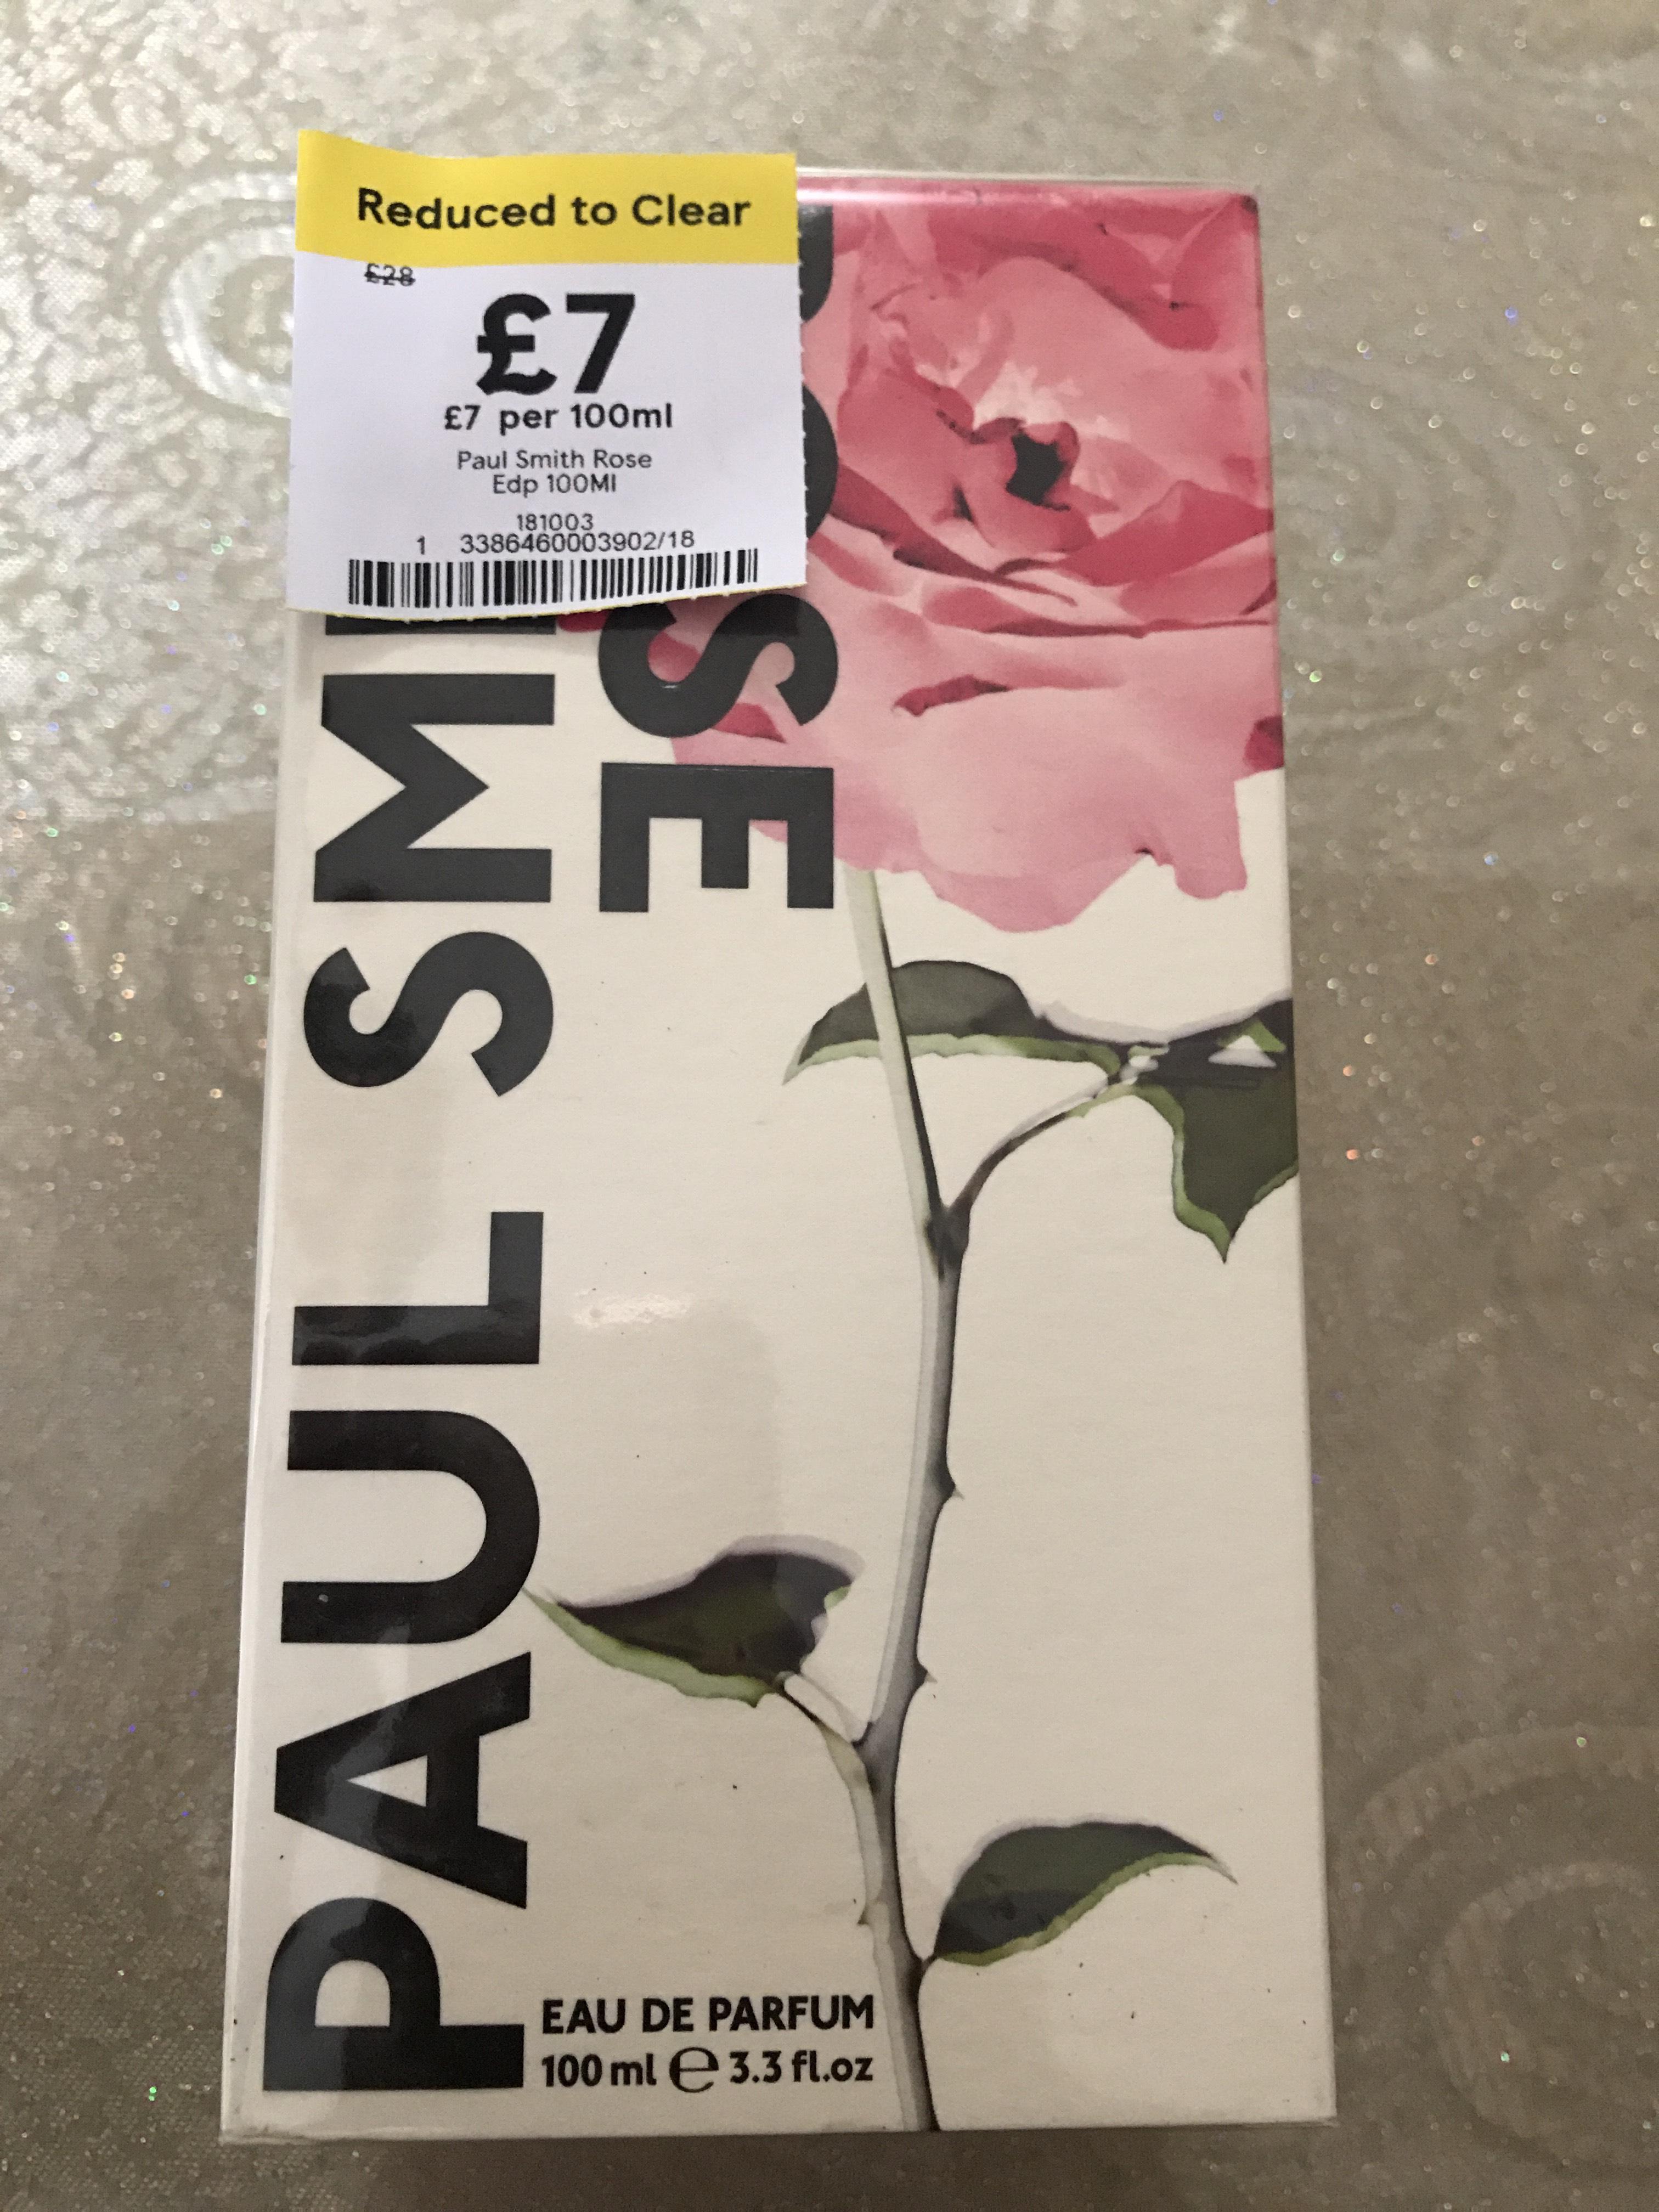 Paul Smith Rose 100ml £7 @ Tesco in store.